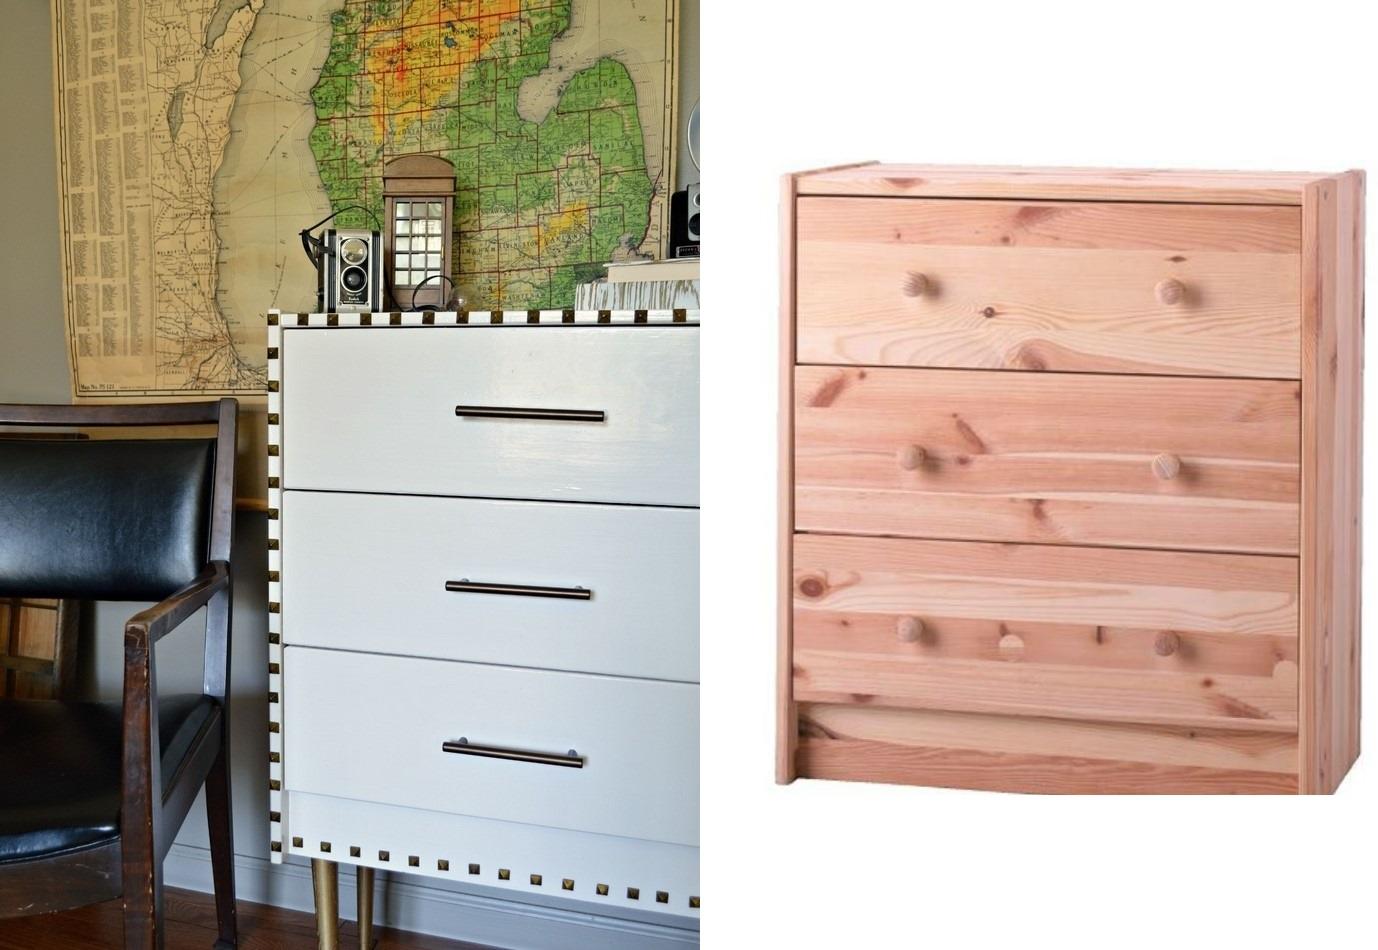 How to hack an IKEA dresser